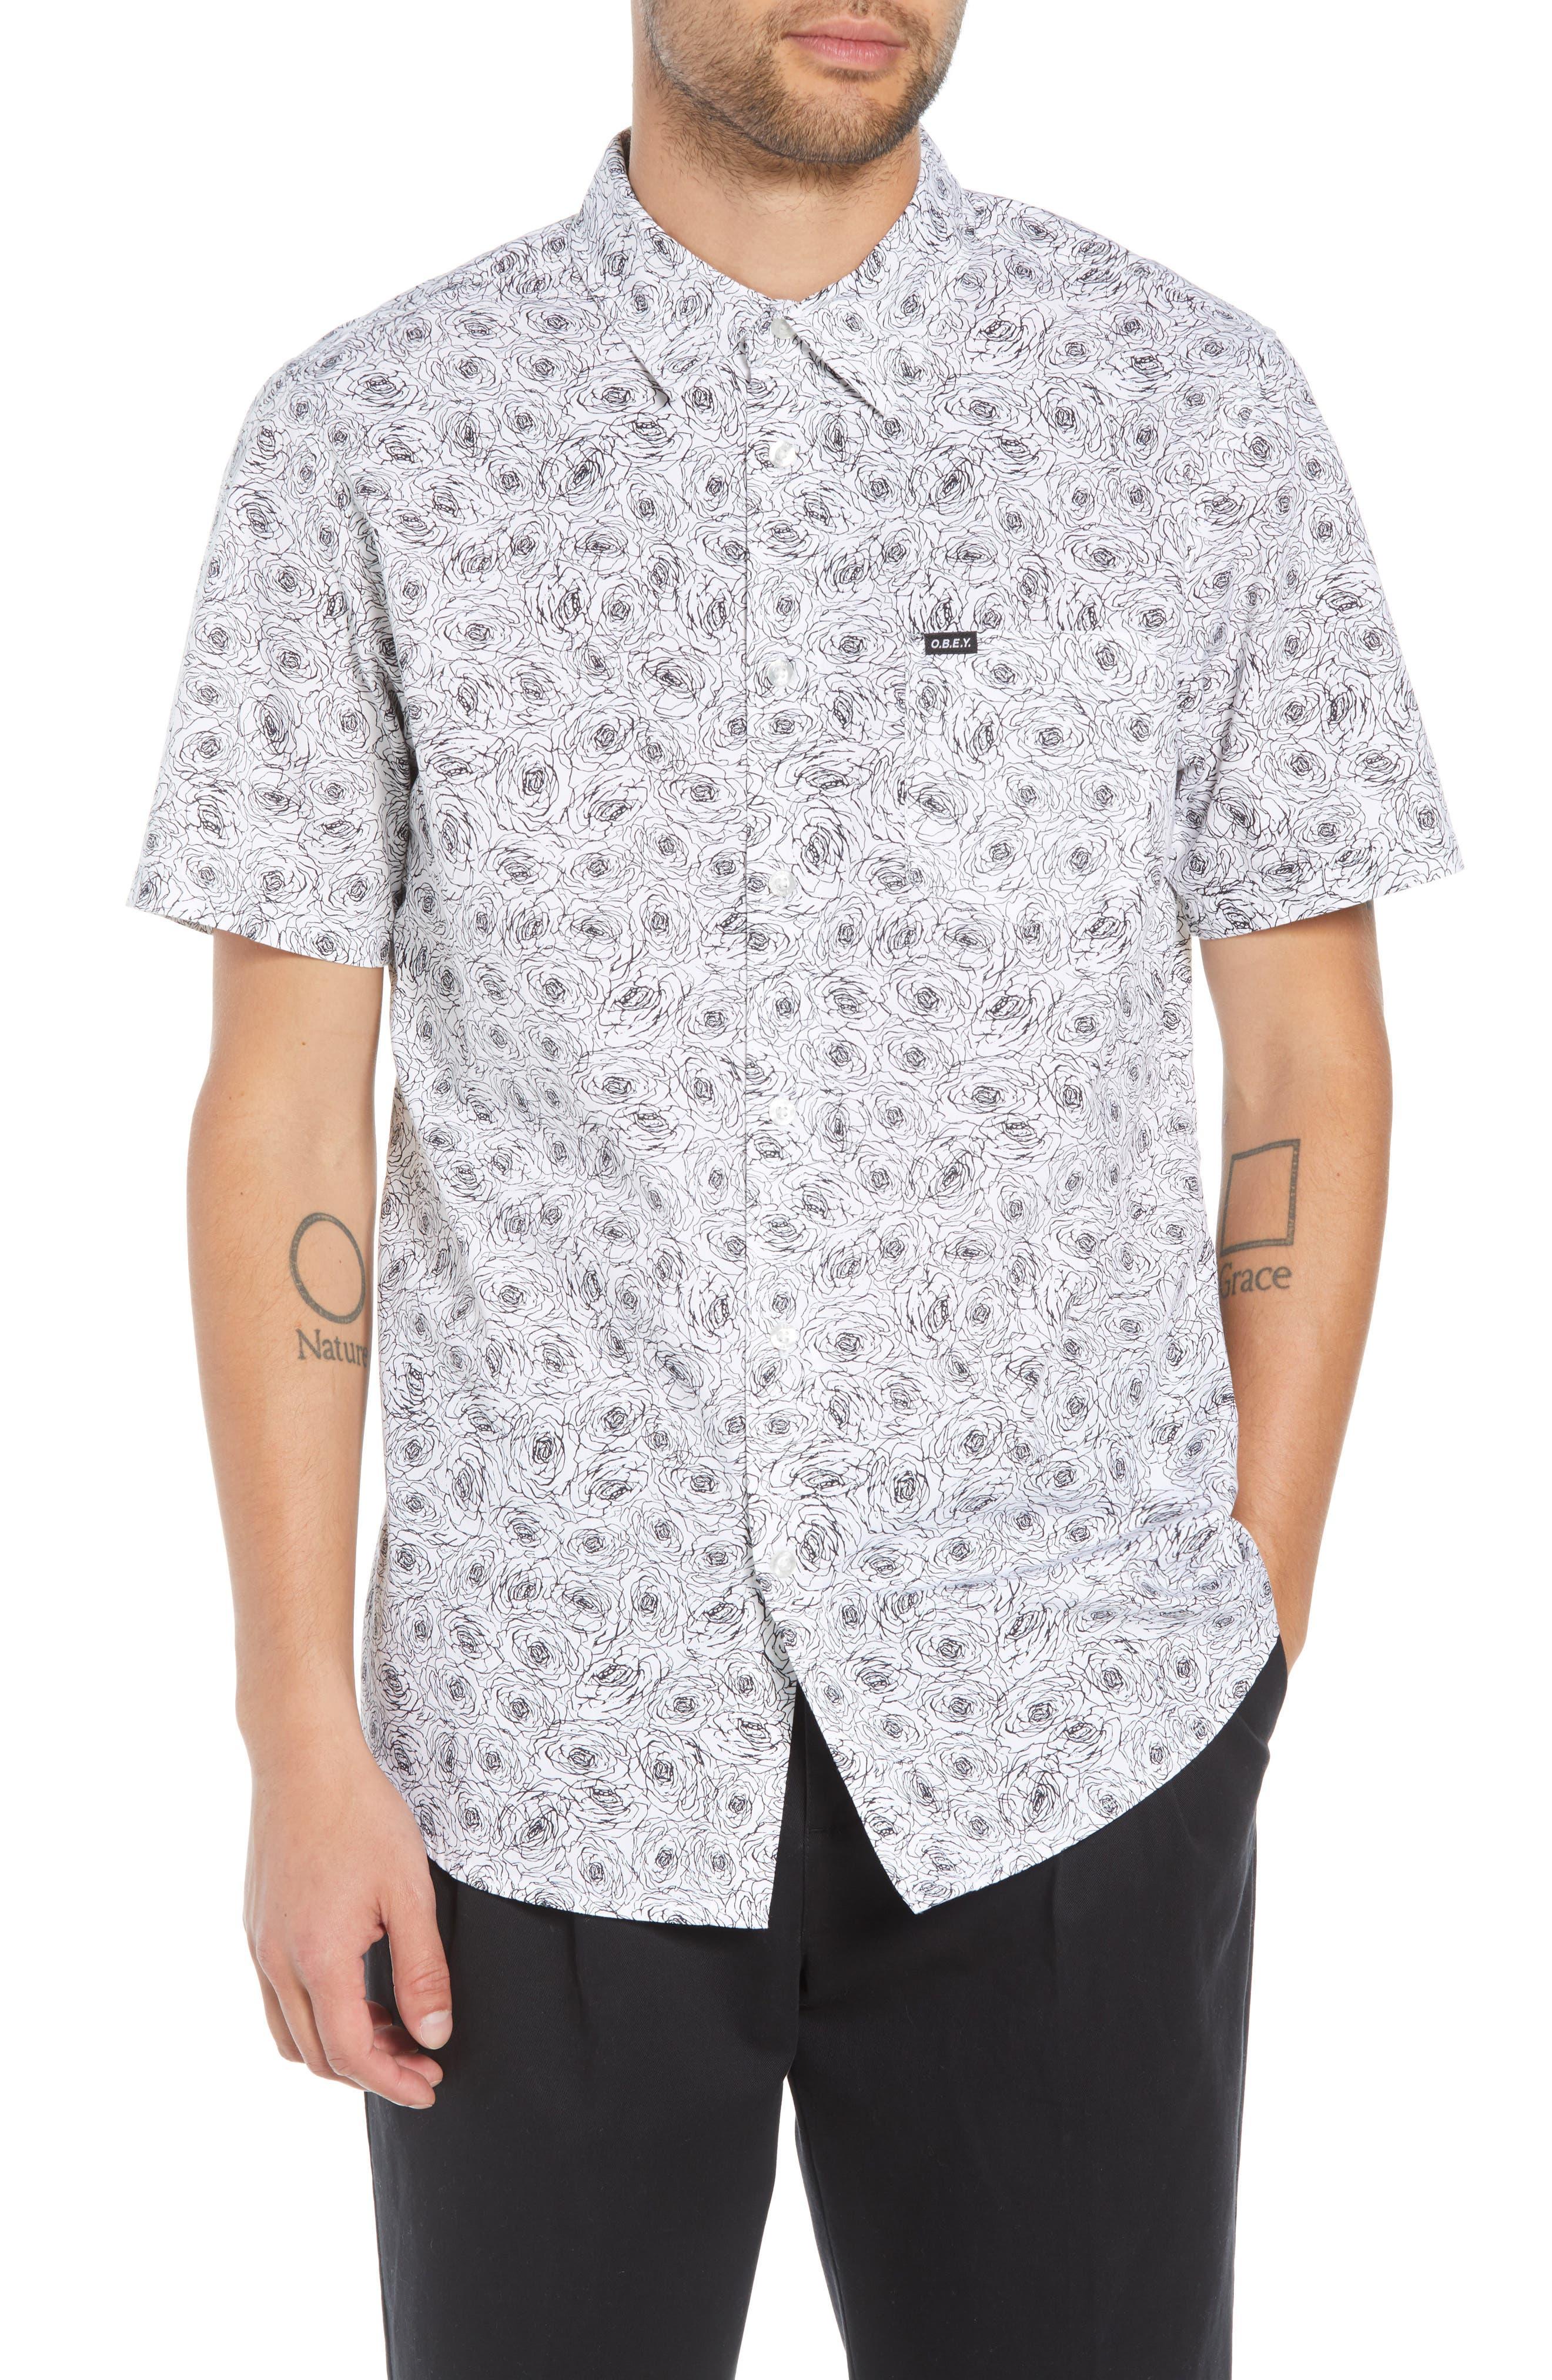 Rosie Print Woven Shirt,                             Main thumbnail 1, color,                             WHITE MULTI